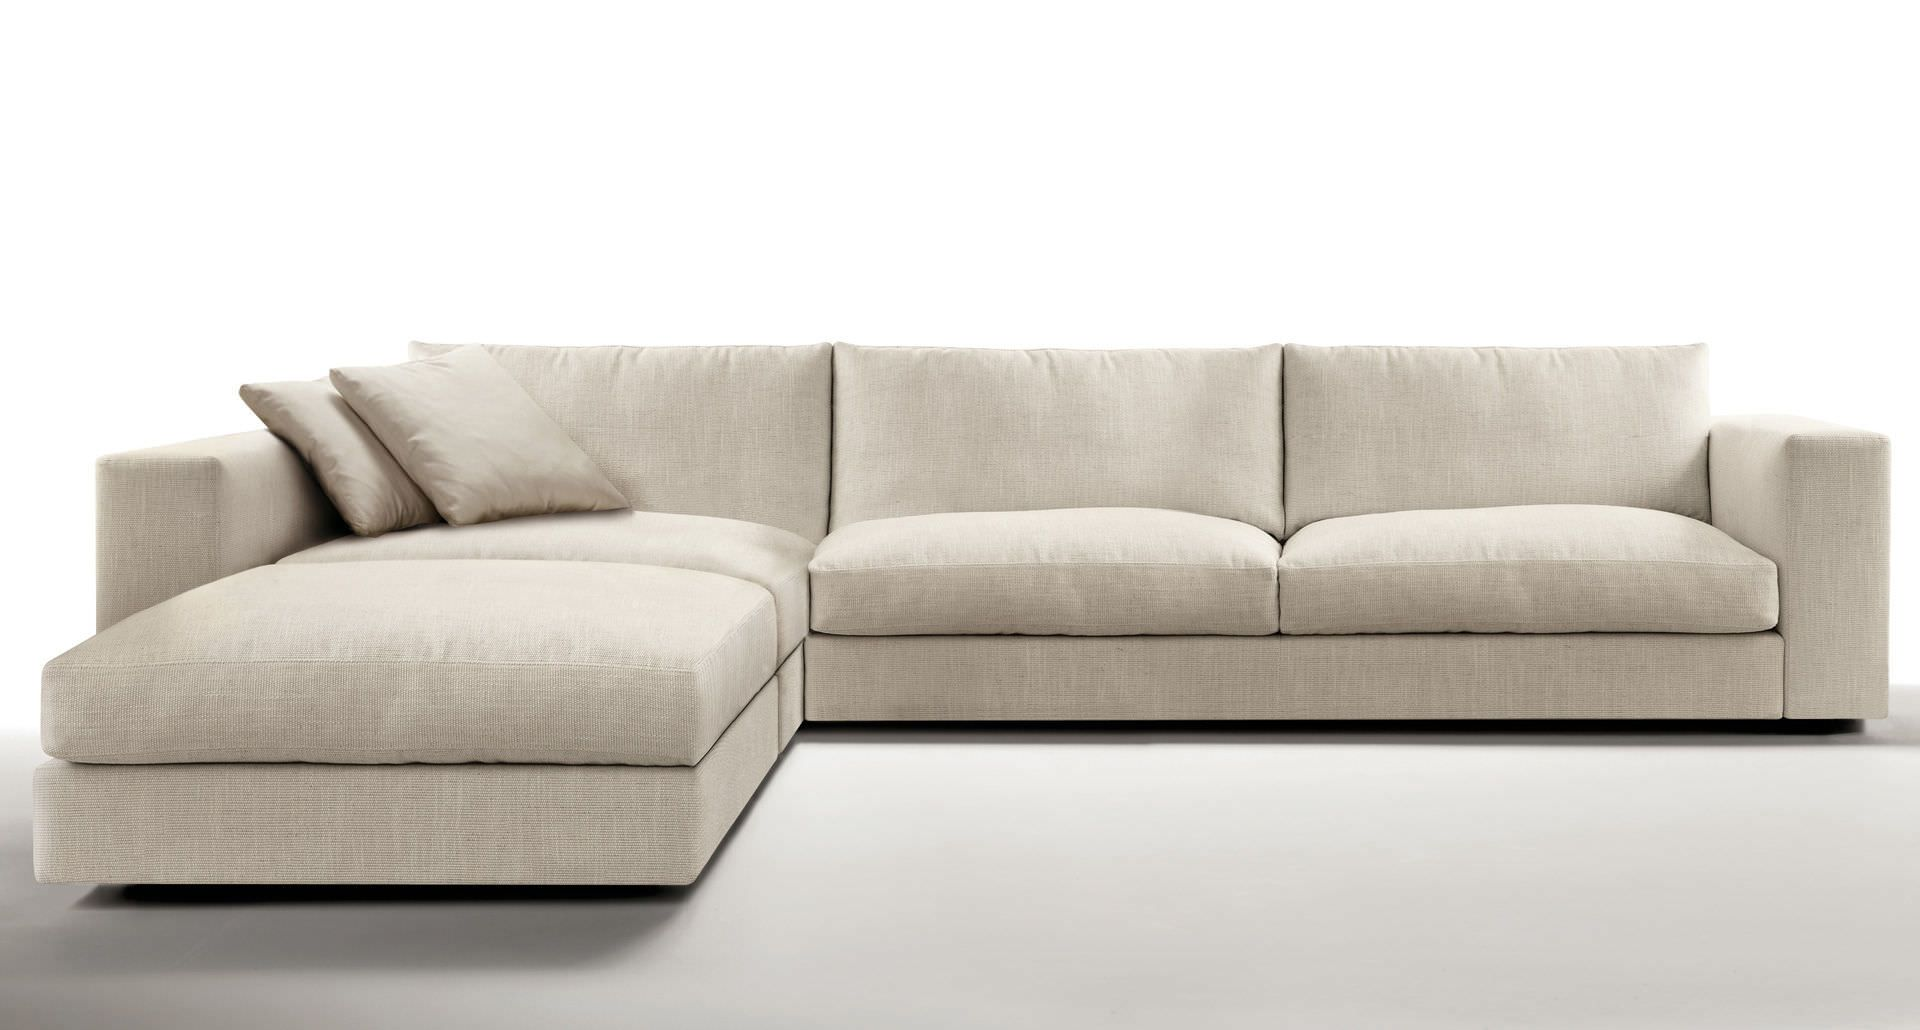 Sofa Set Companies In India Foster Jonathan Adler Corner Manufacturers